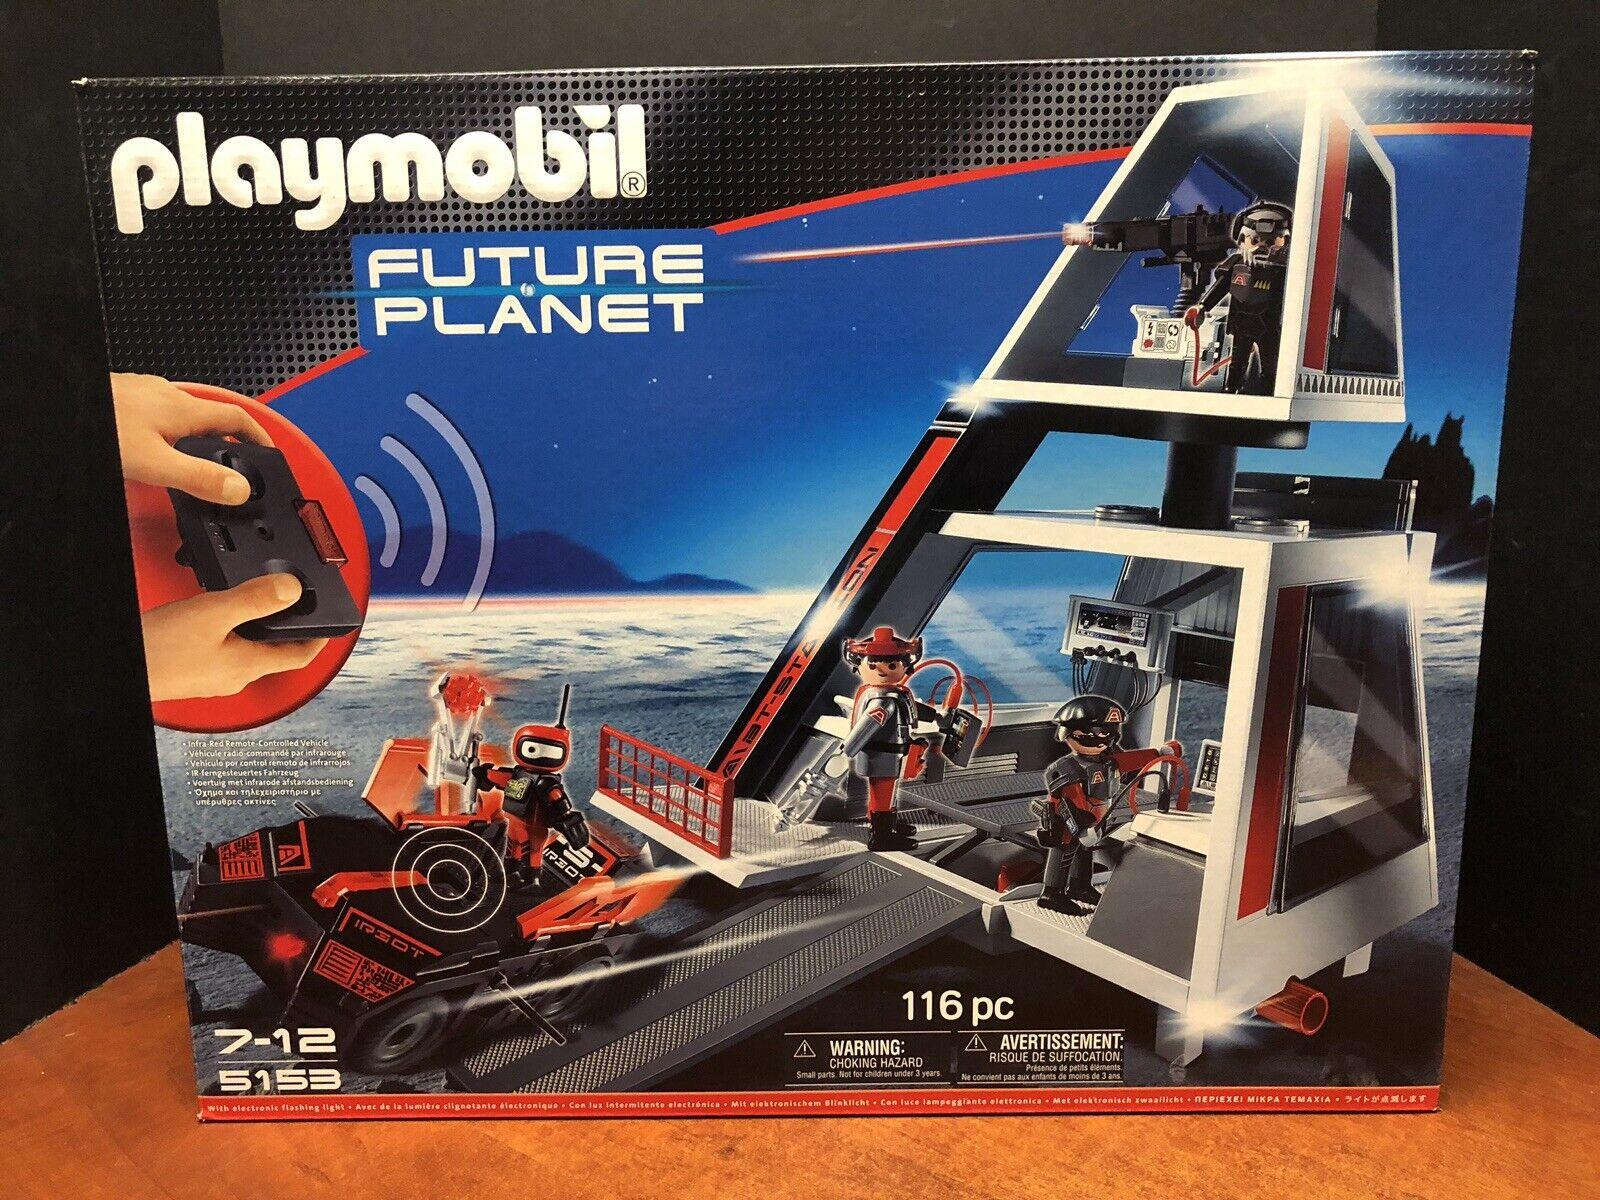 Playmobil Future Planet 5153 Dela0867